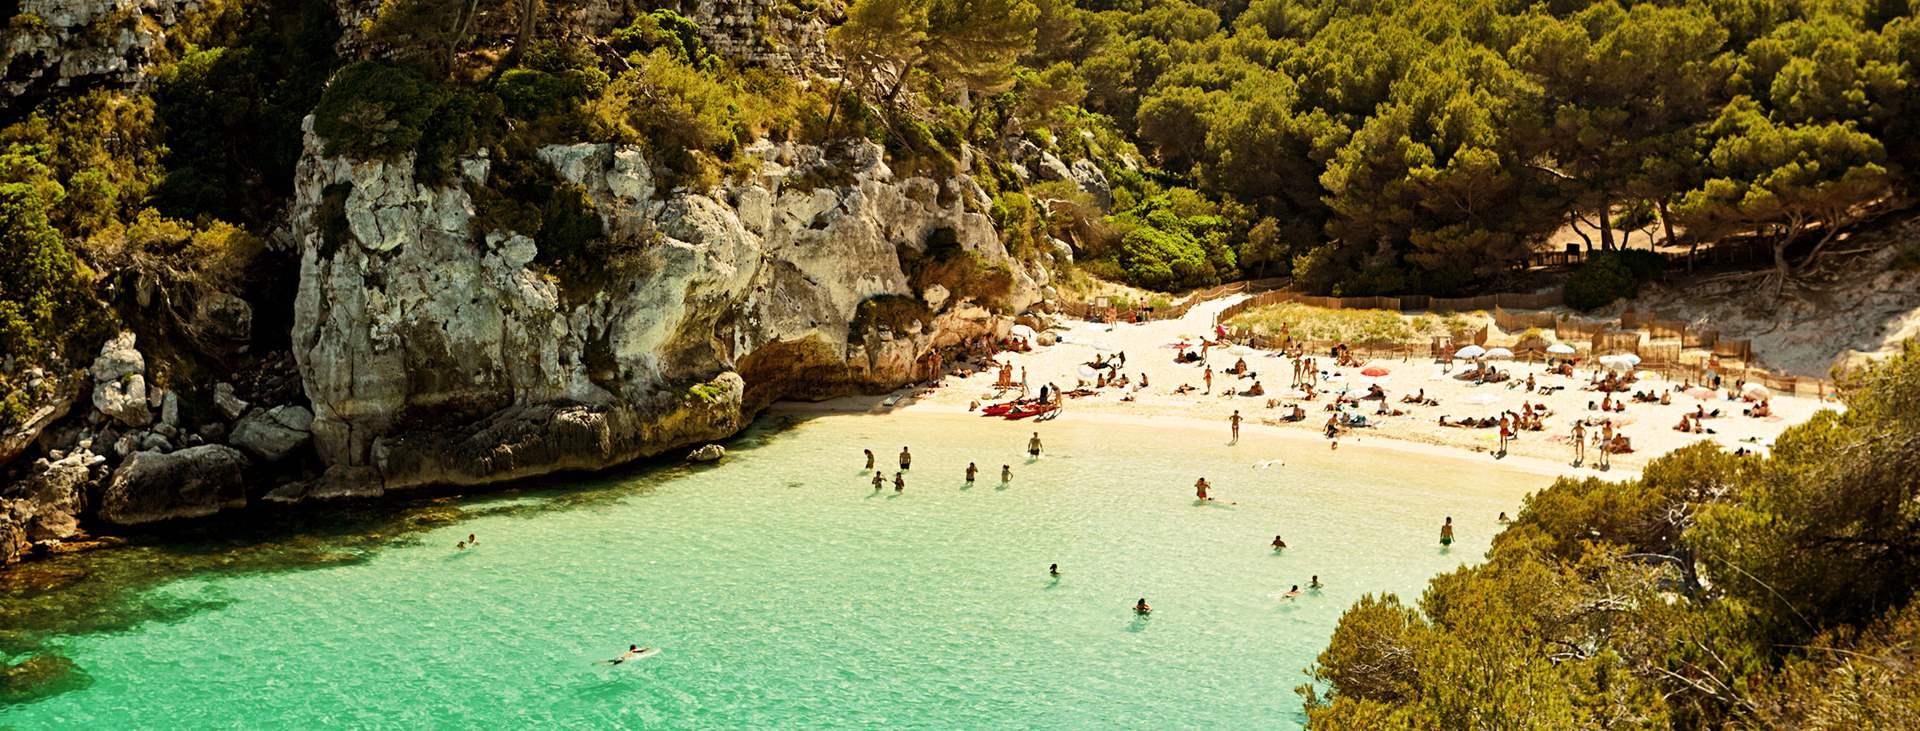 Menorca Espanja Matkat Tjareborgilta